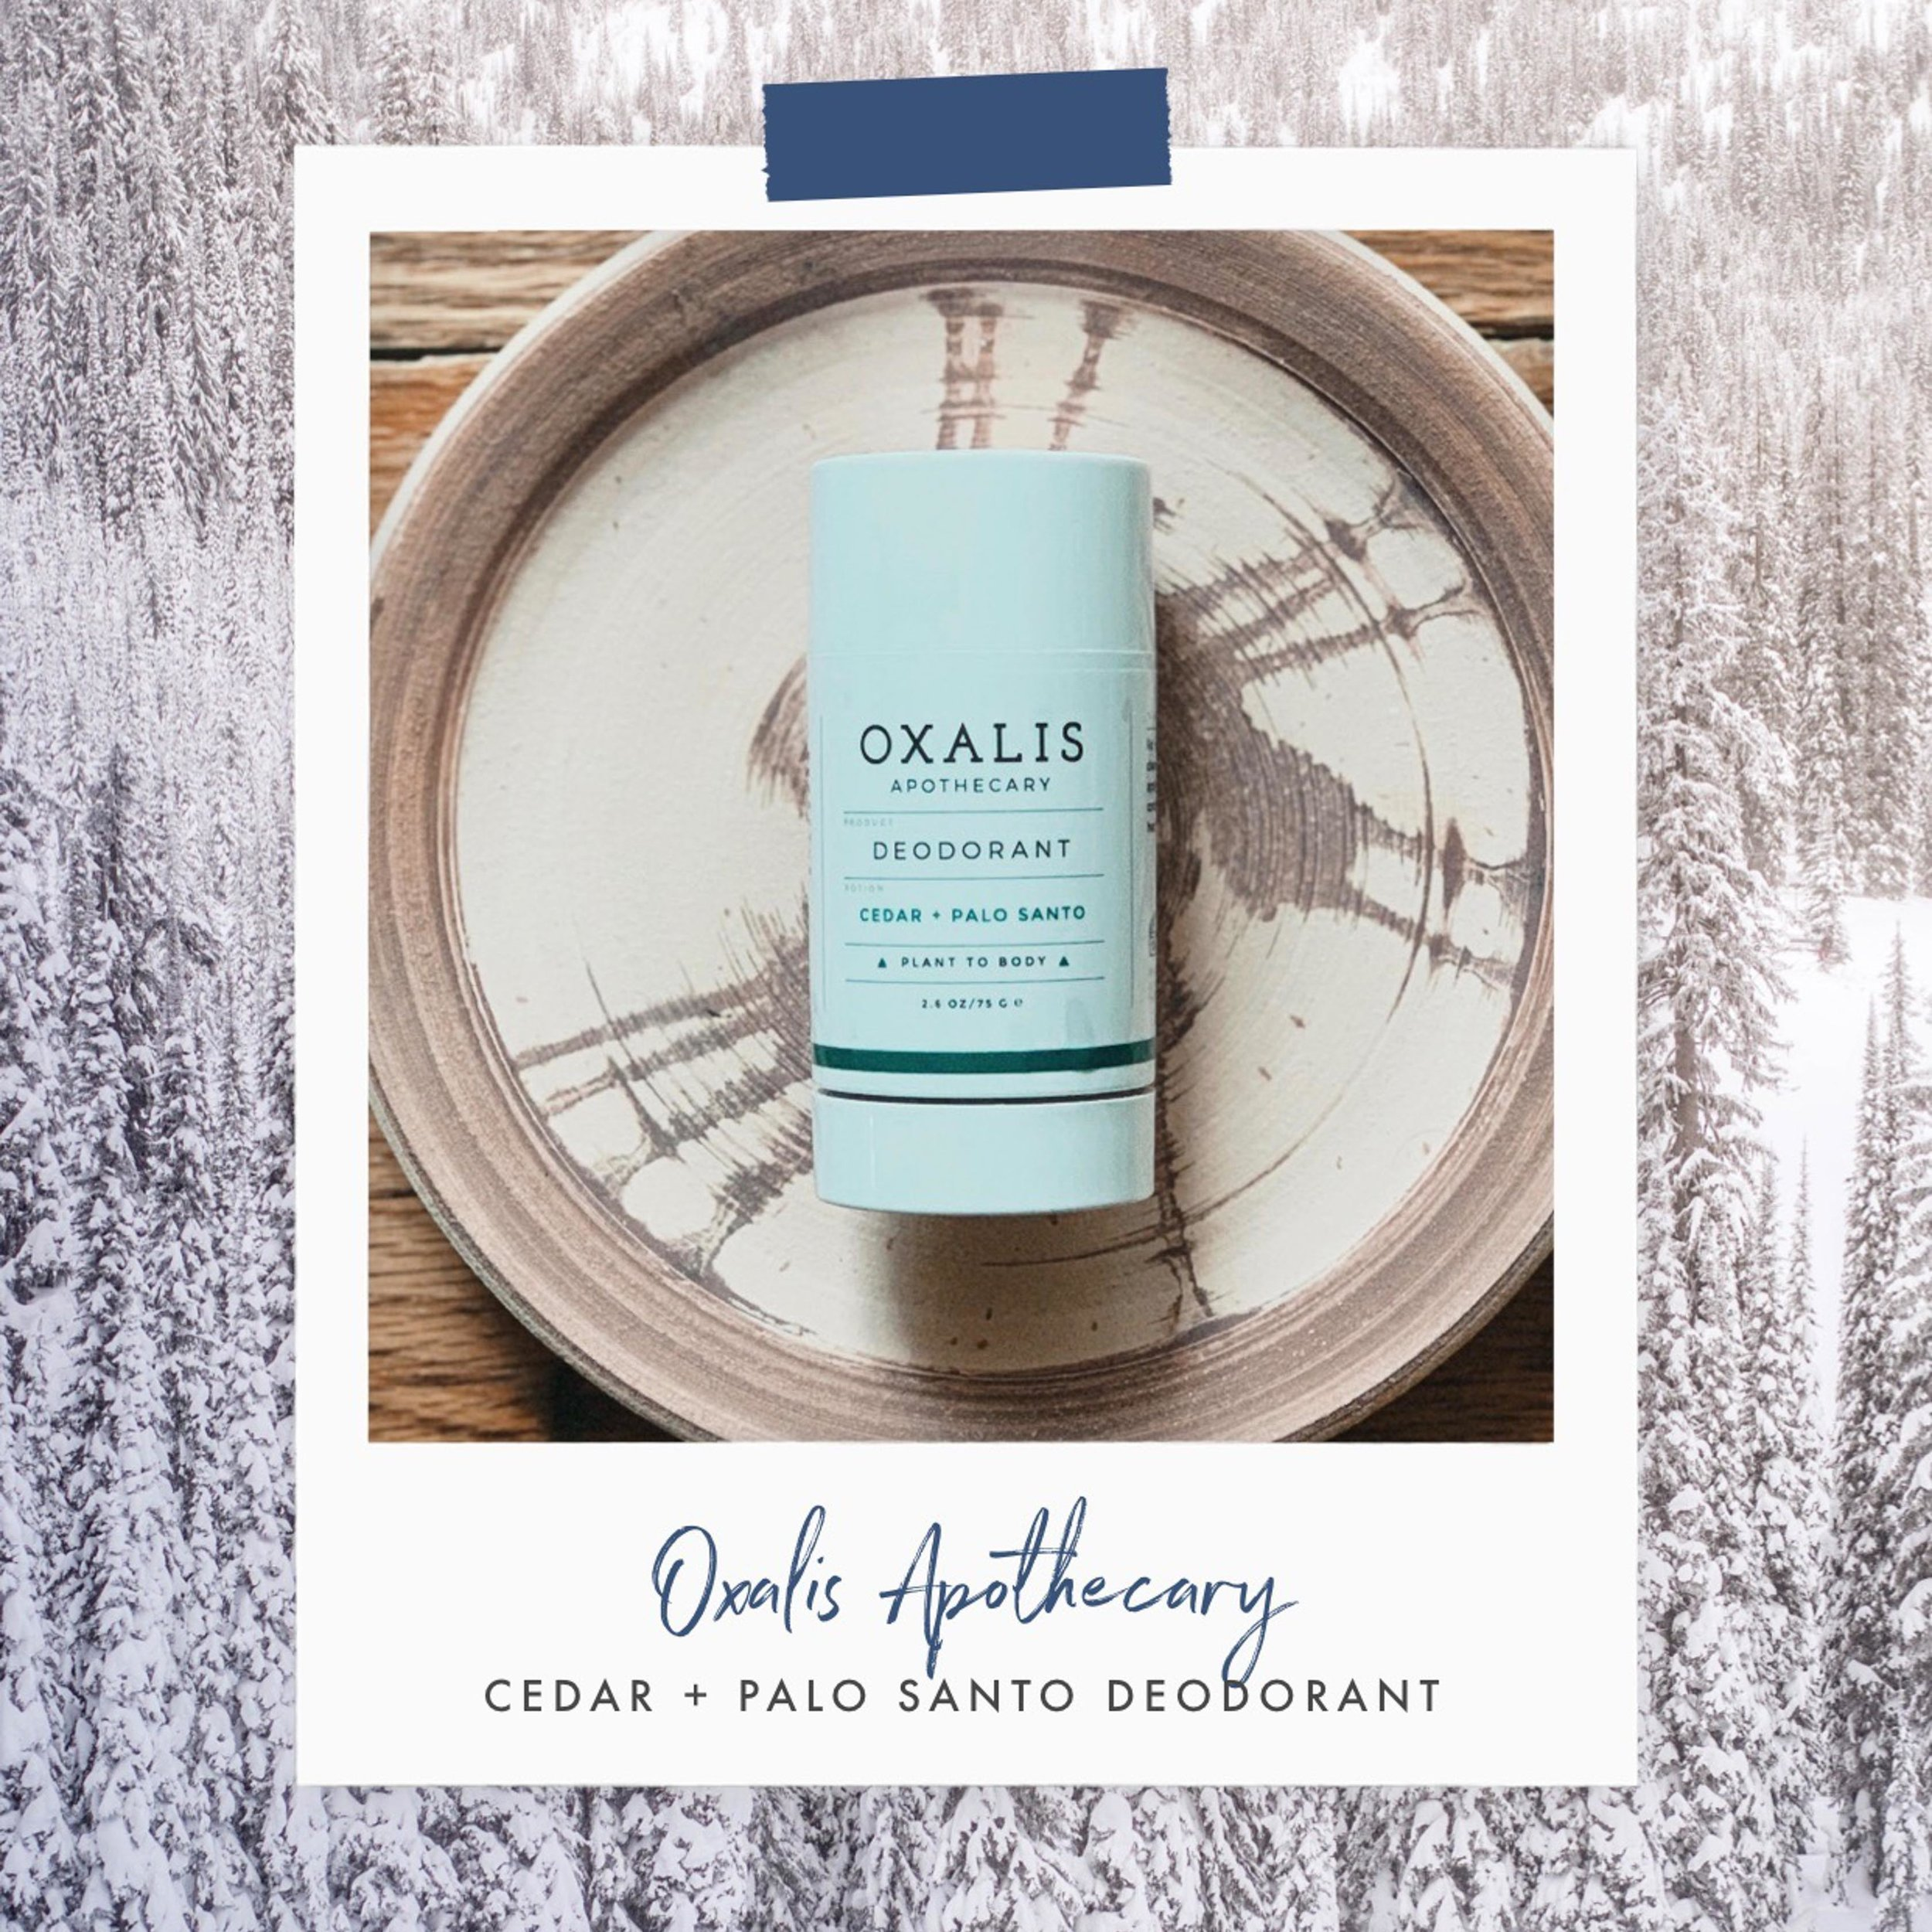 Cedar + Palo Santo Deodorant